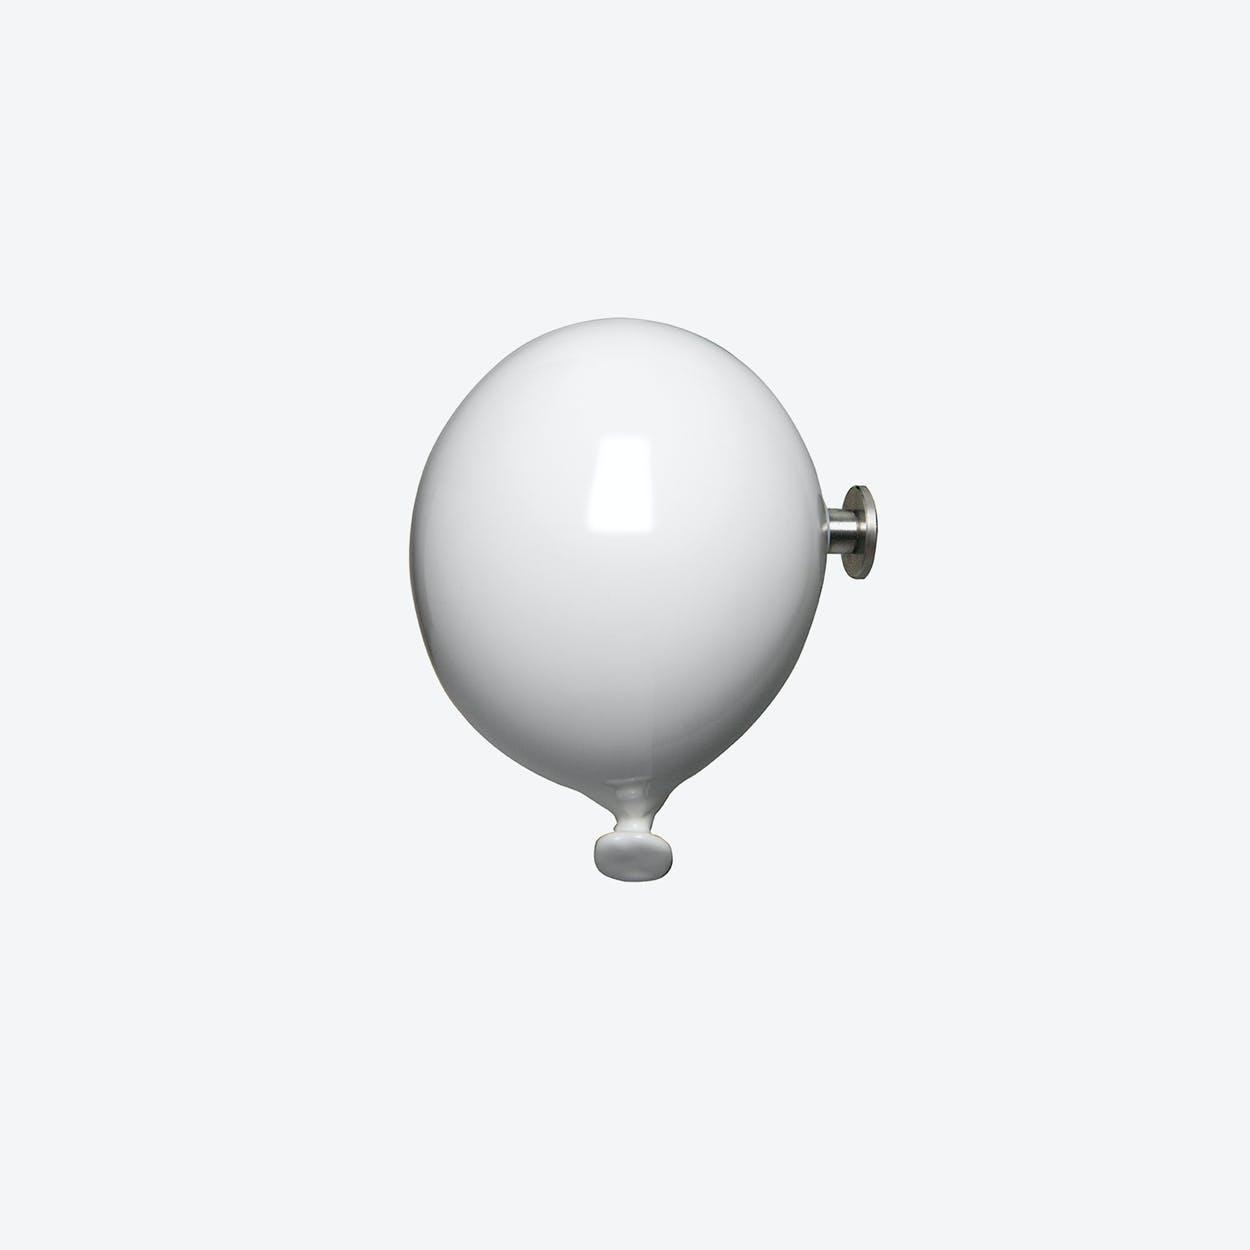 Mini Balloon Wall Hook in White